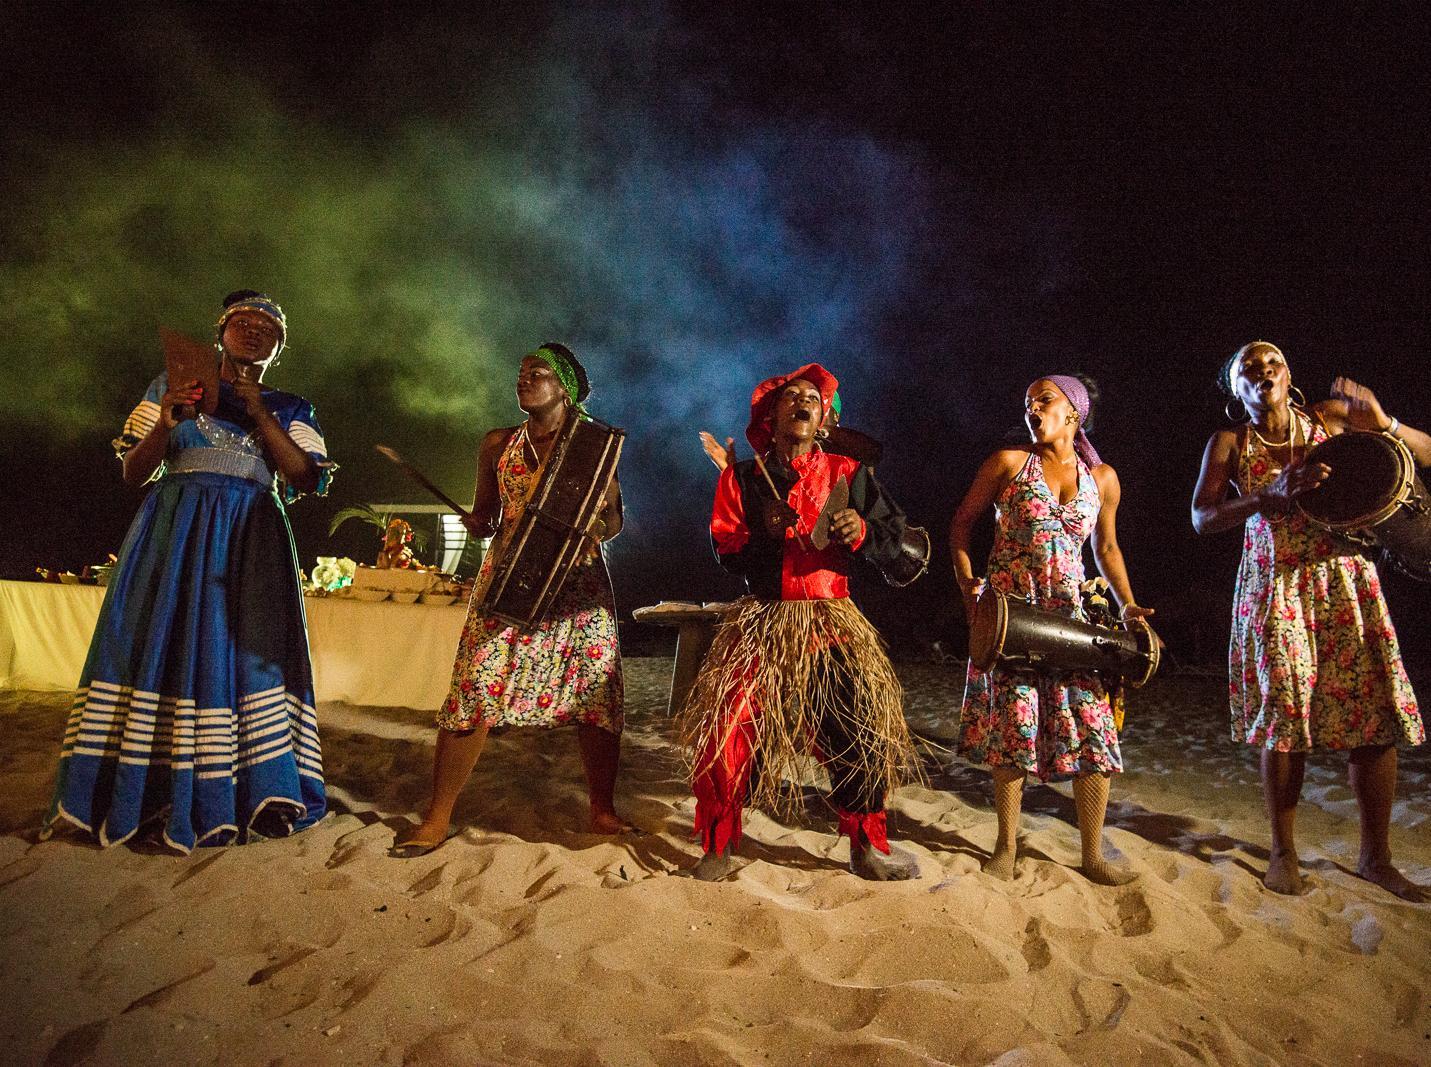 bodas-rustico-playa-cuba-6822.jpg